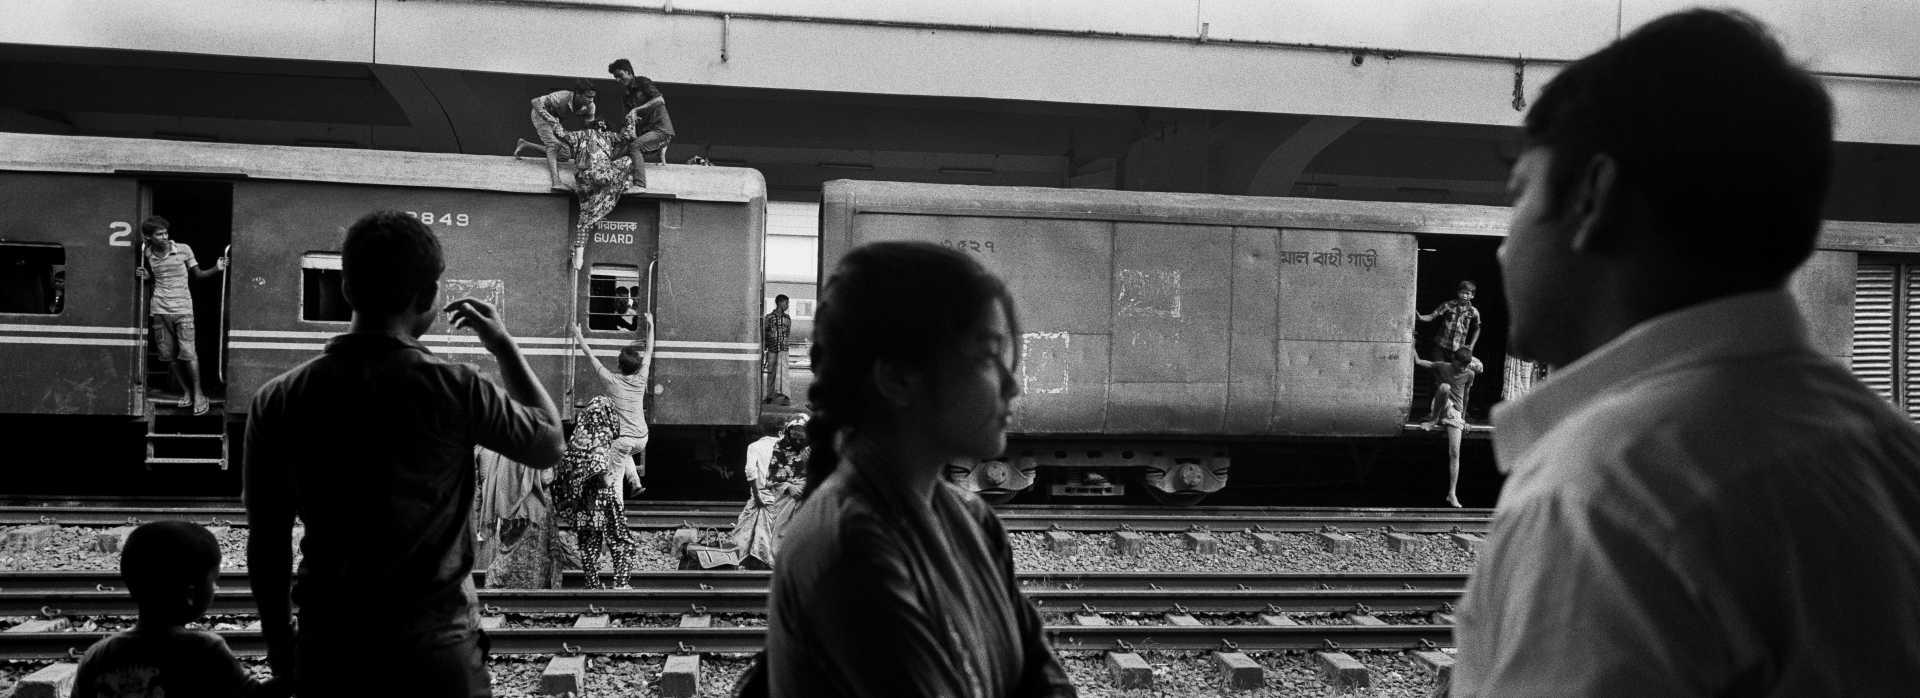 Kamalapur Railway Station. Dhaka, Bangladesh.